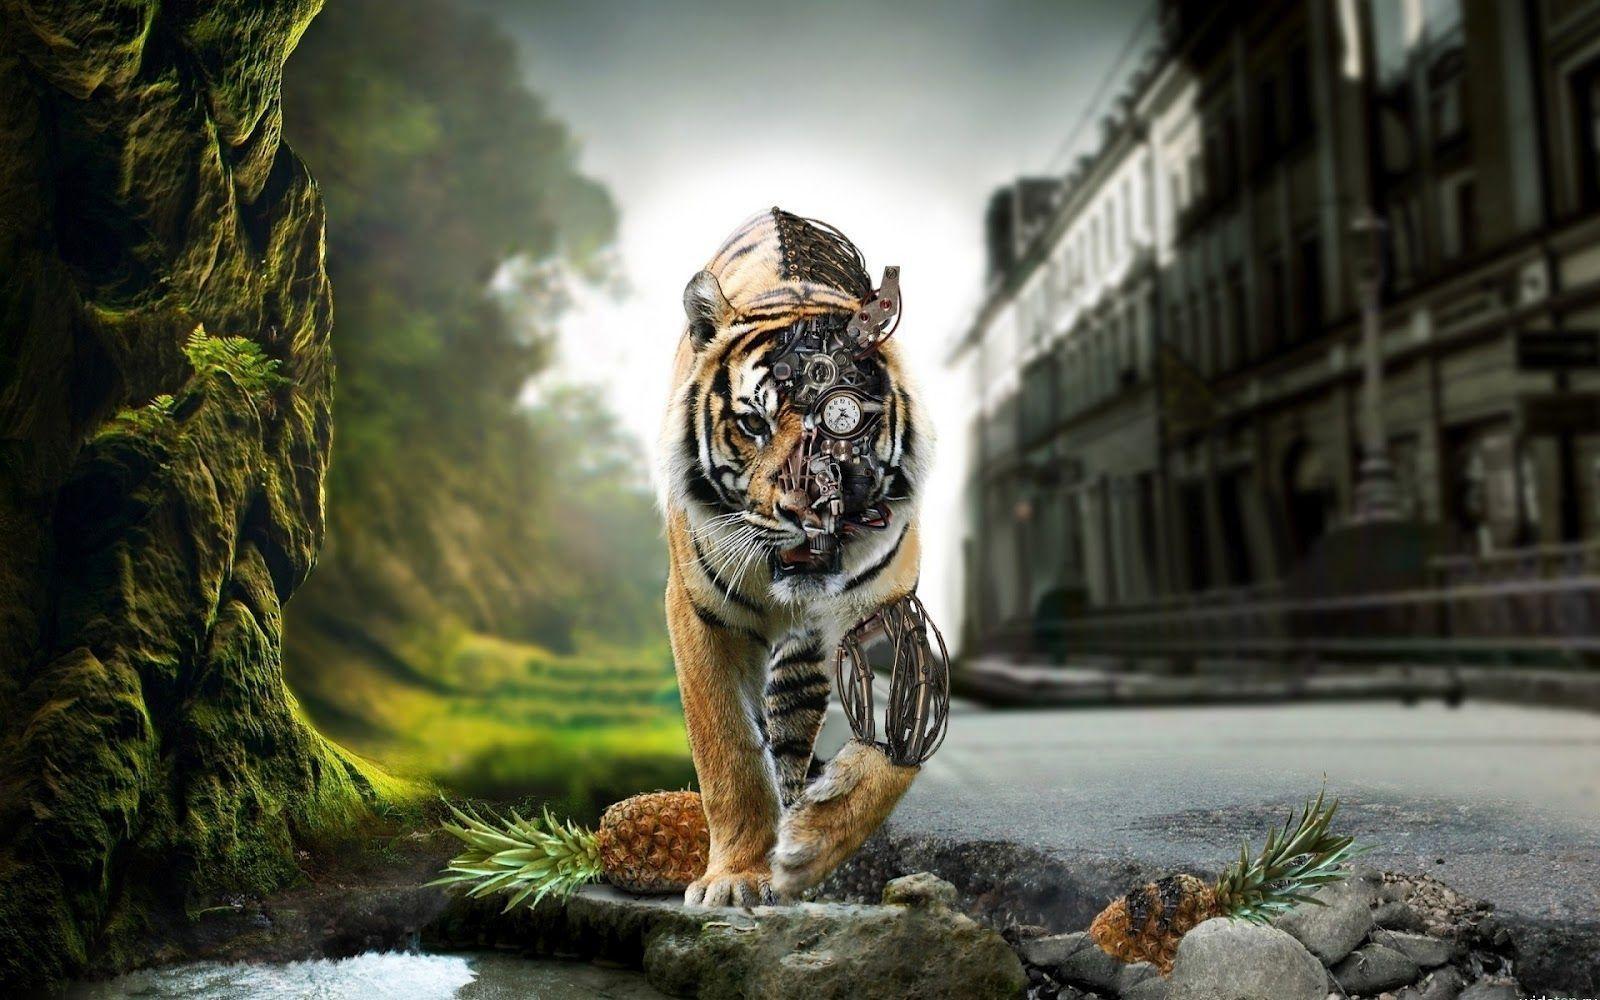 1 Tiger Wallpaper Tigers 1024×768 - High Definition Wallpaper ...